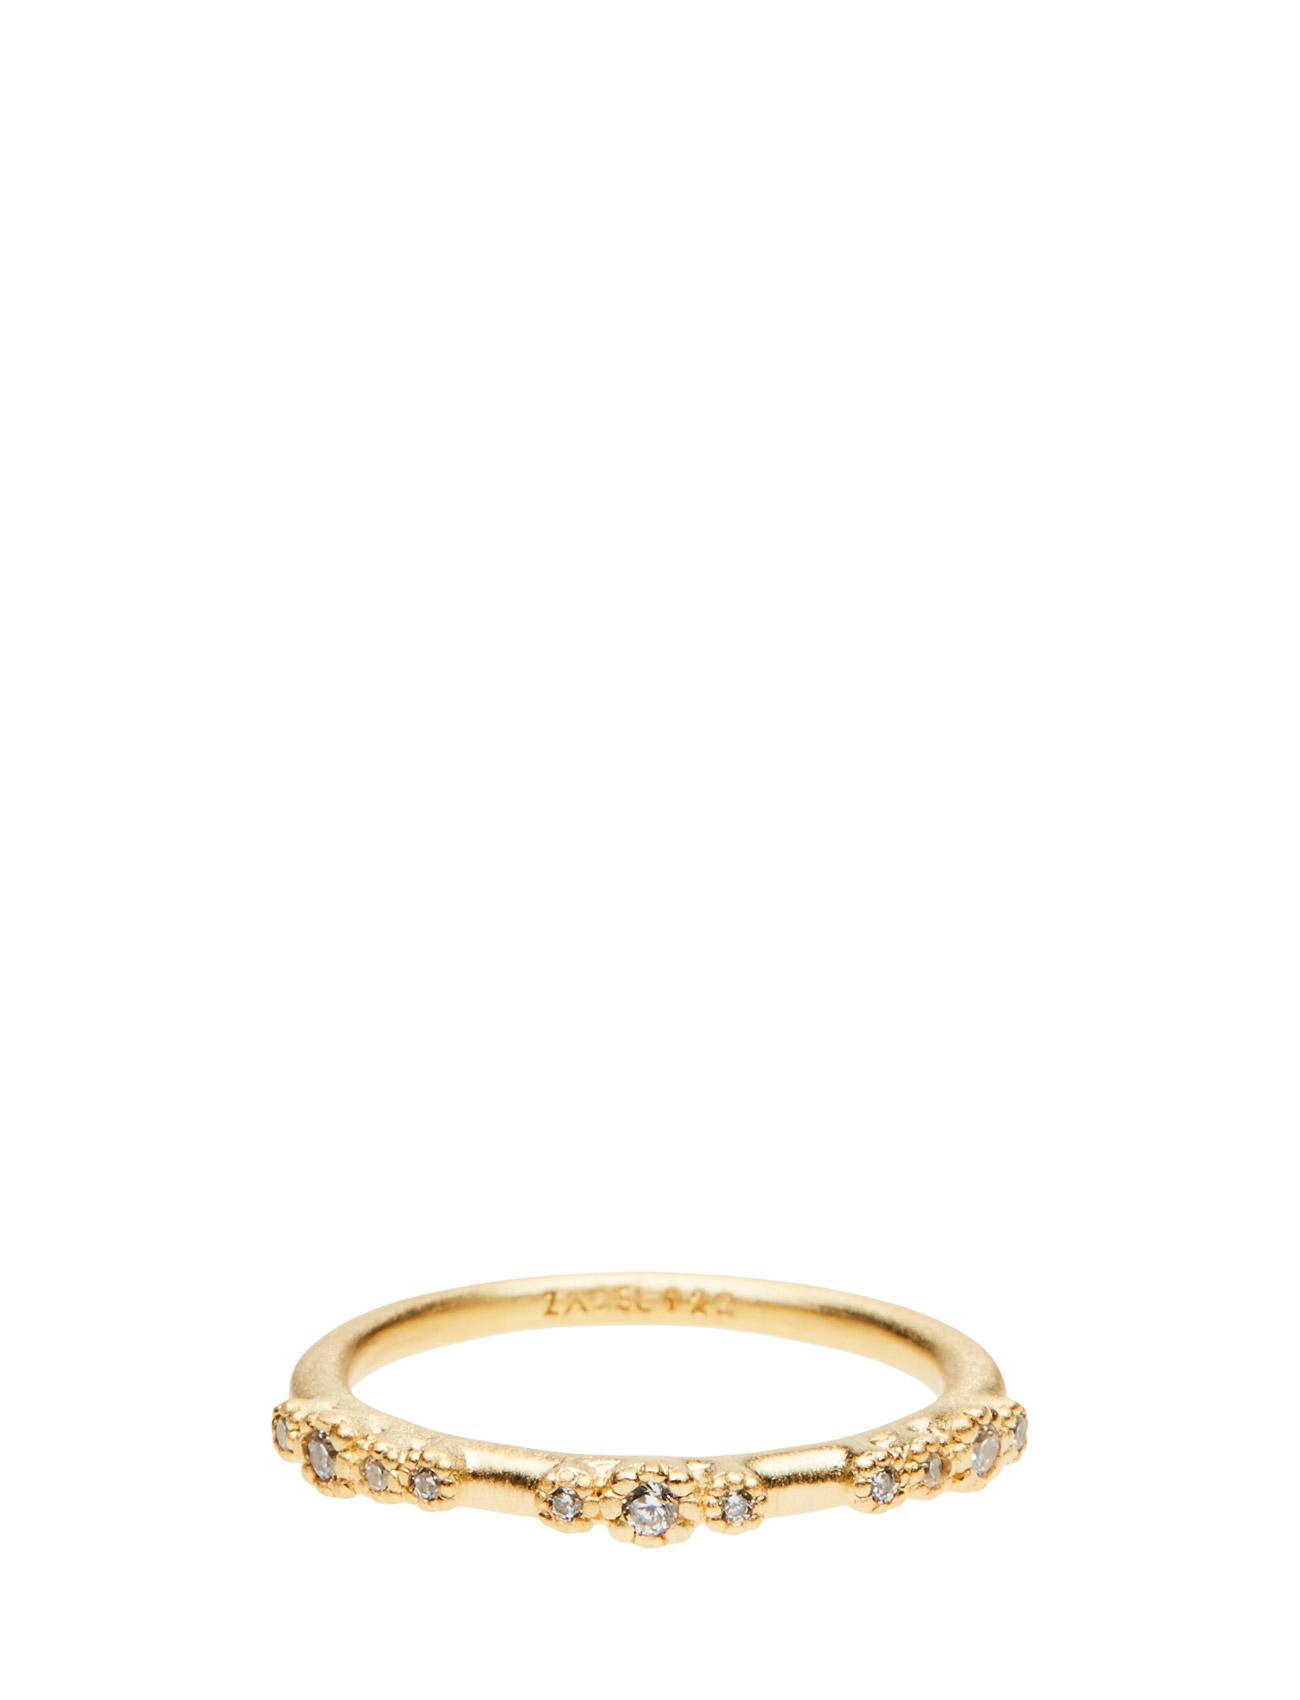 zabel jewellery Sakura på boozt.com dk